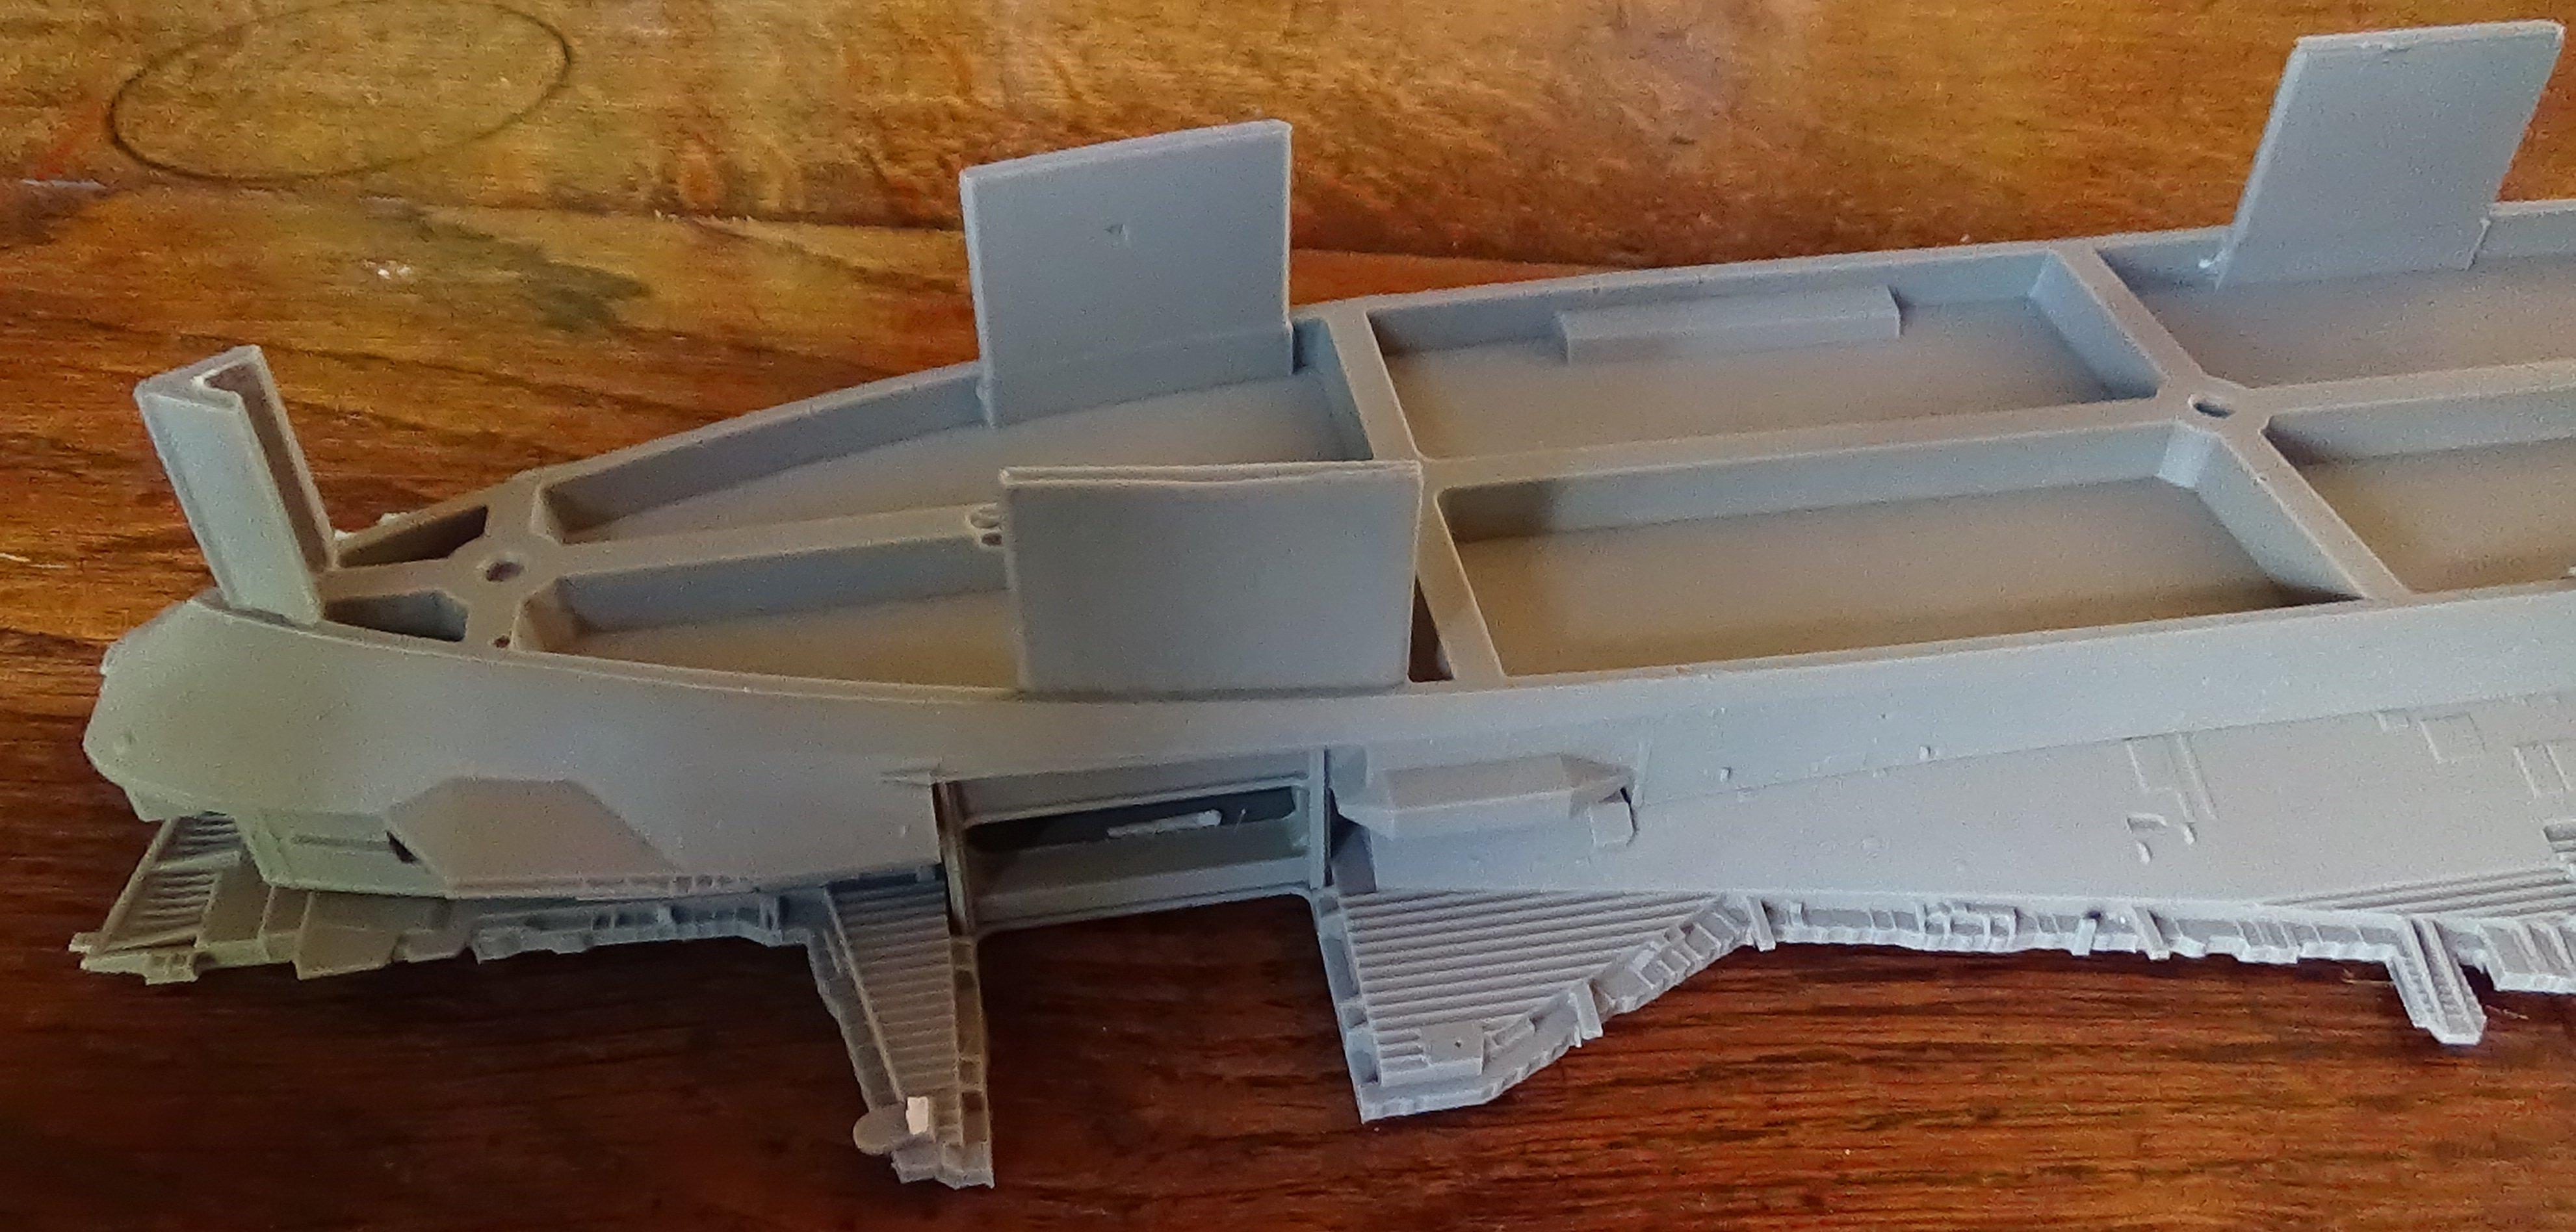 [USS Midway CVA-41] Porte avions lourd américain-700e-Orange Hobby 17071905024923134915155989